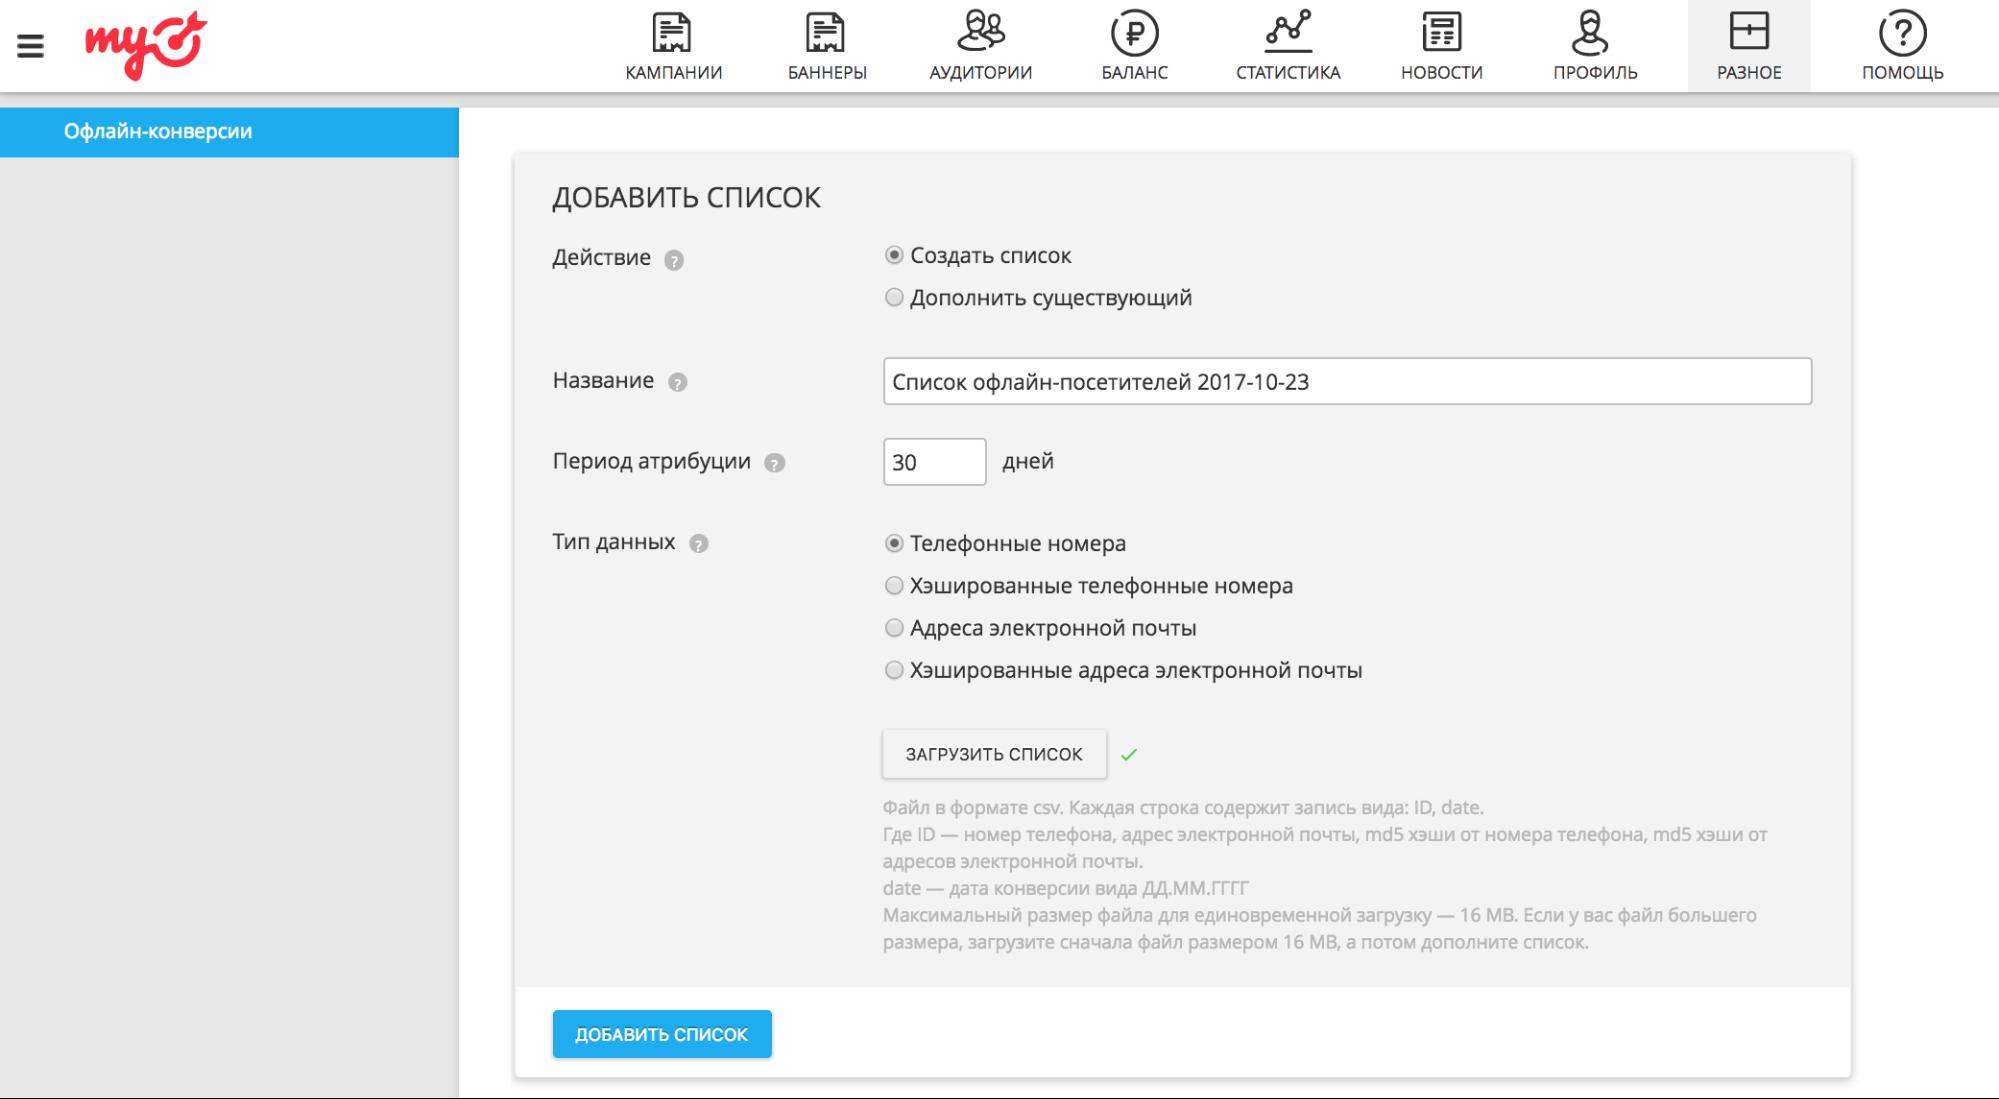 Офлайн-конверсии — добавление списка в myTarget